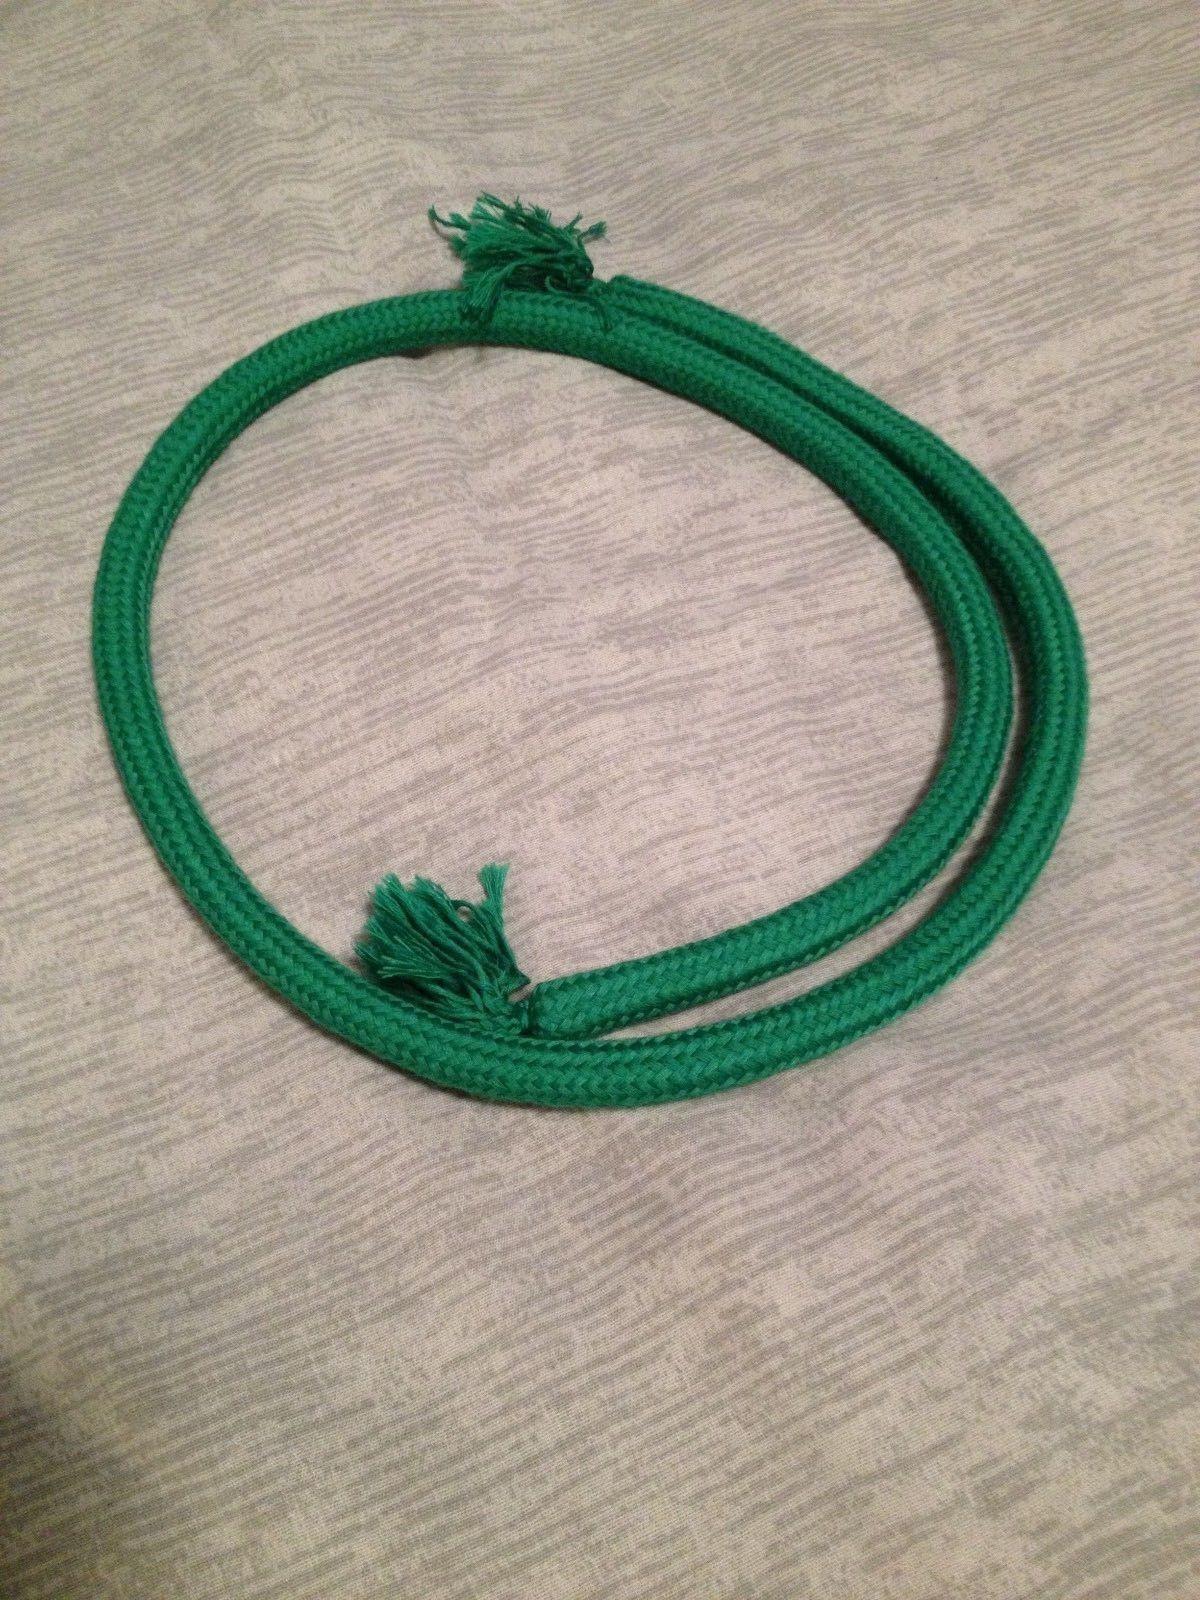 Magic Stiff Rope - Rope Becomes Stiff or Rigid Seemingly at Will - Stiff Rope